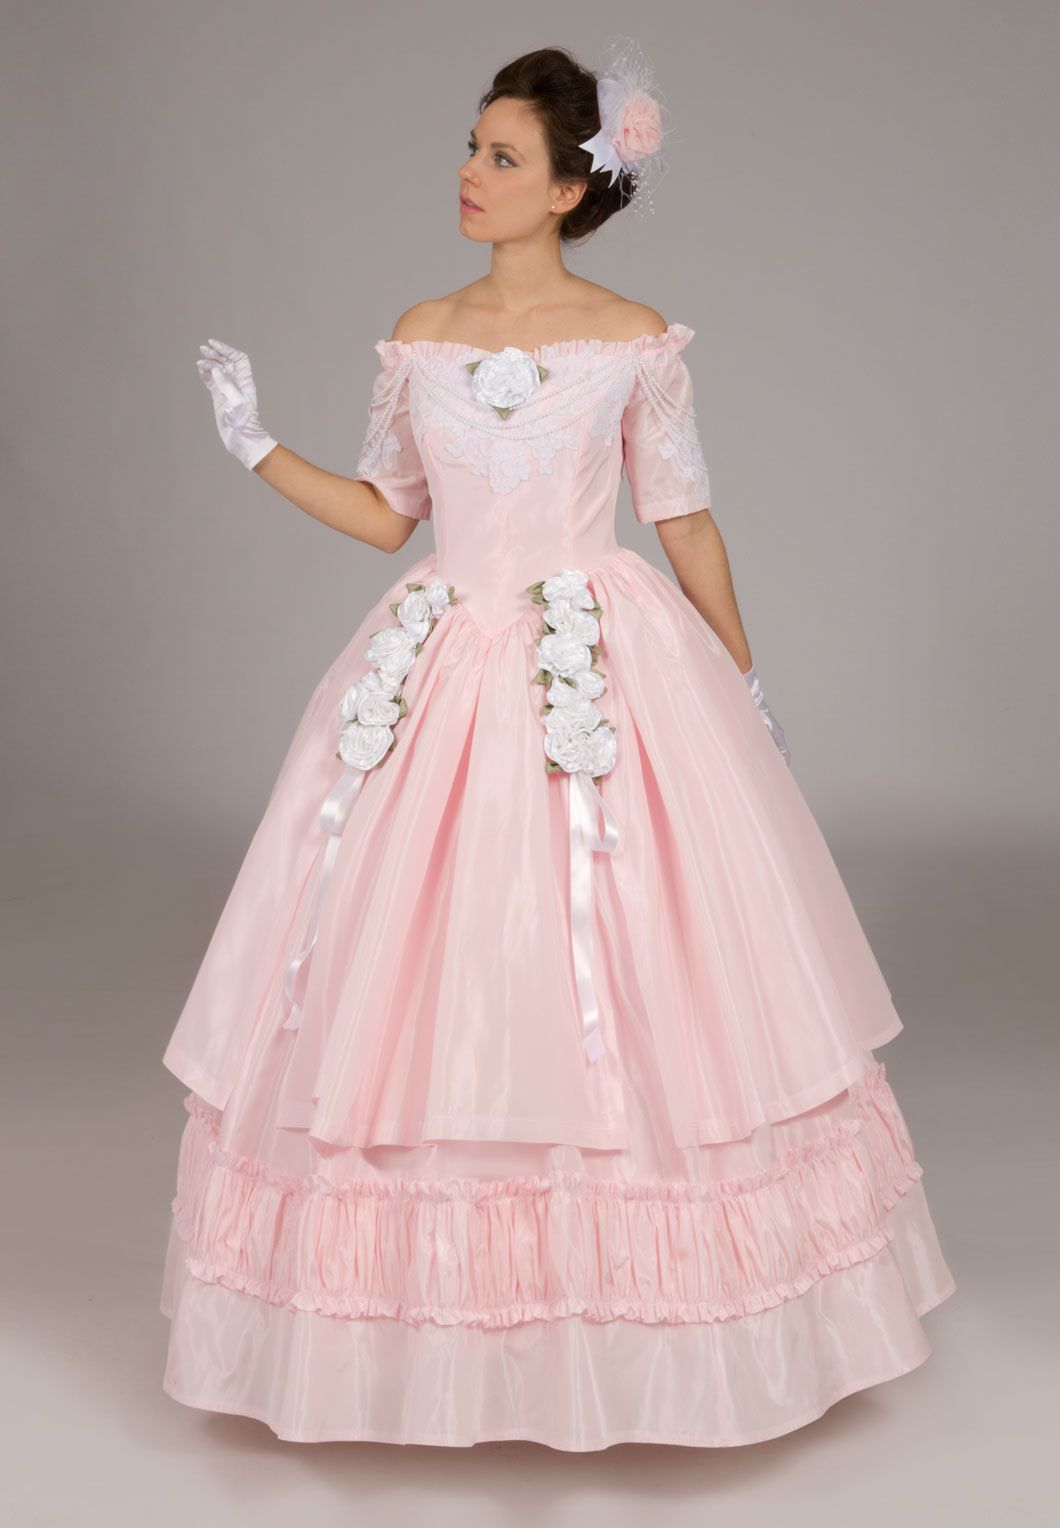 Victorian, Edwardian, and Civil War Ball Gowns | TRAJES DE BAILE ...